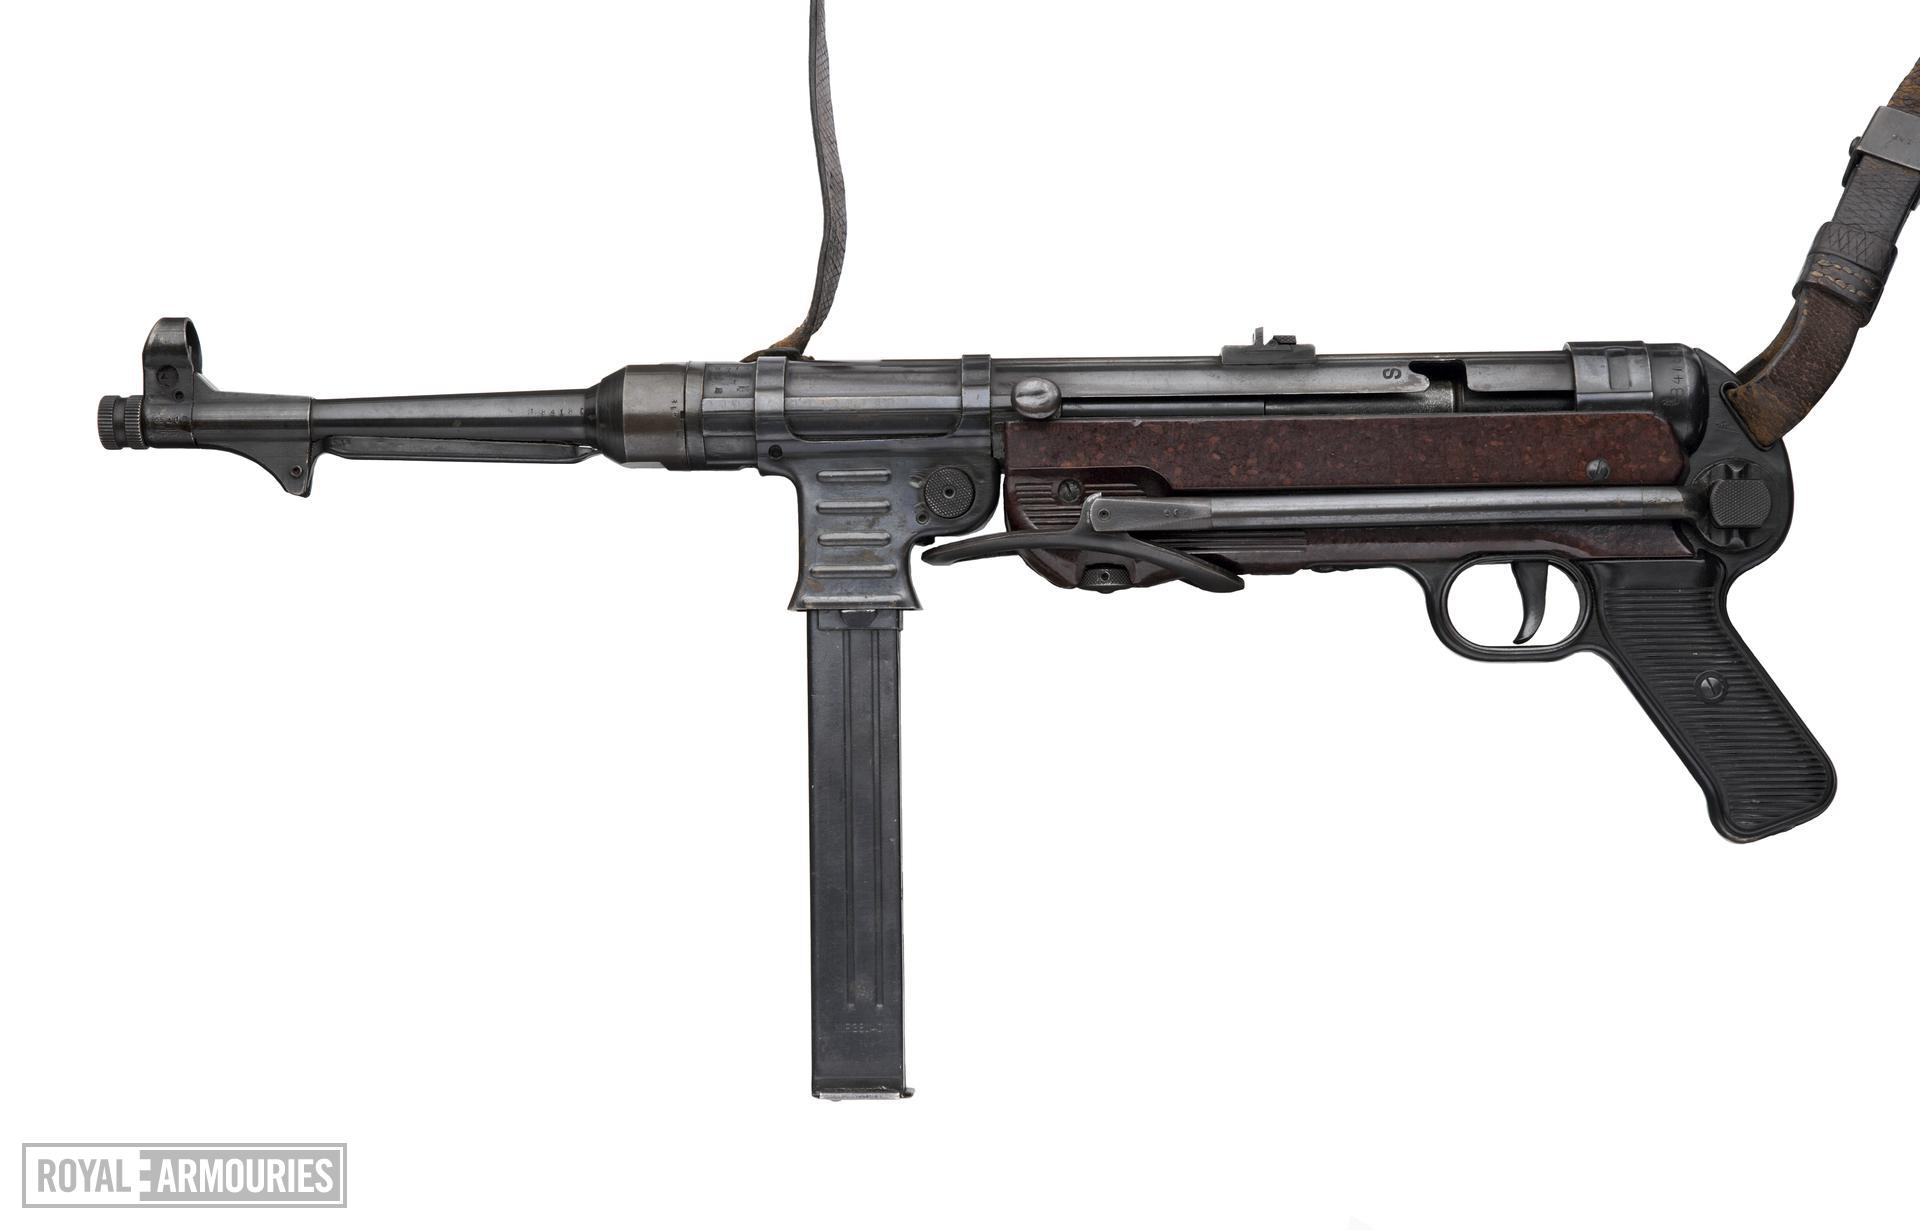 Centrefire automatic submachine gun - MP40 By Erma